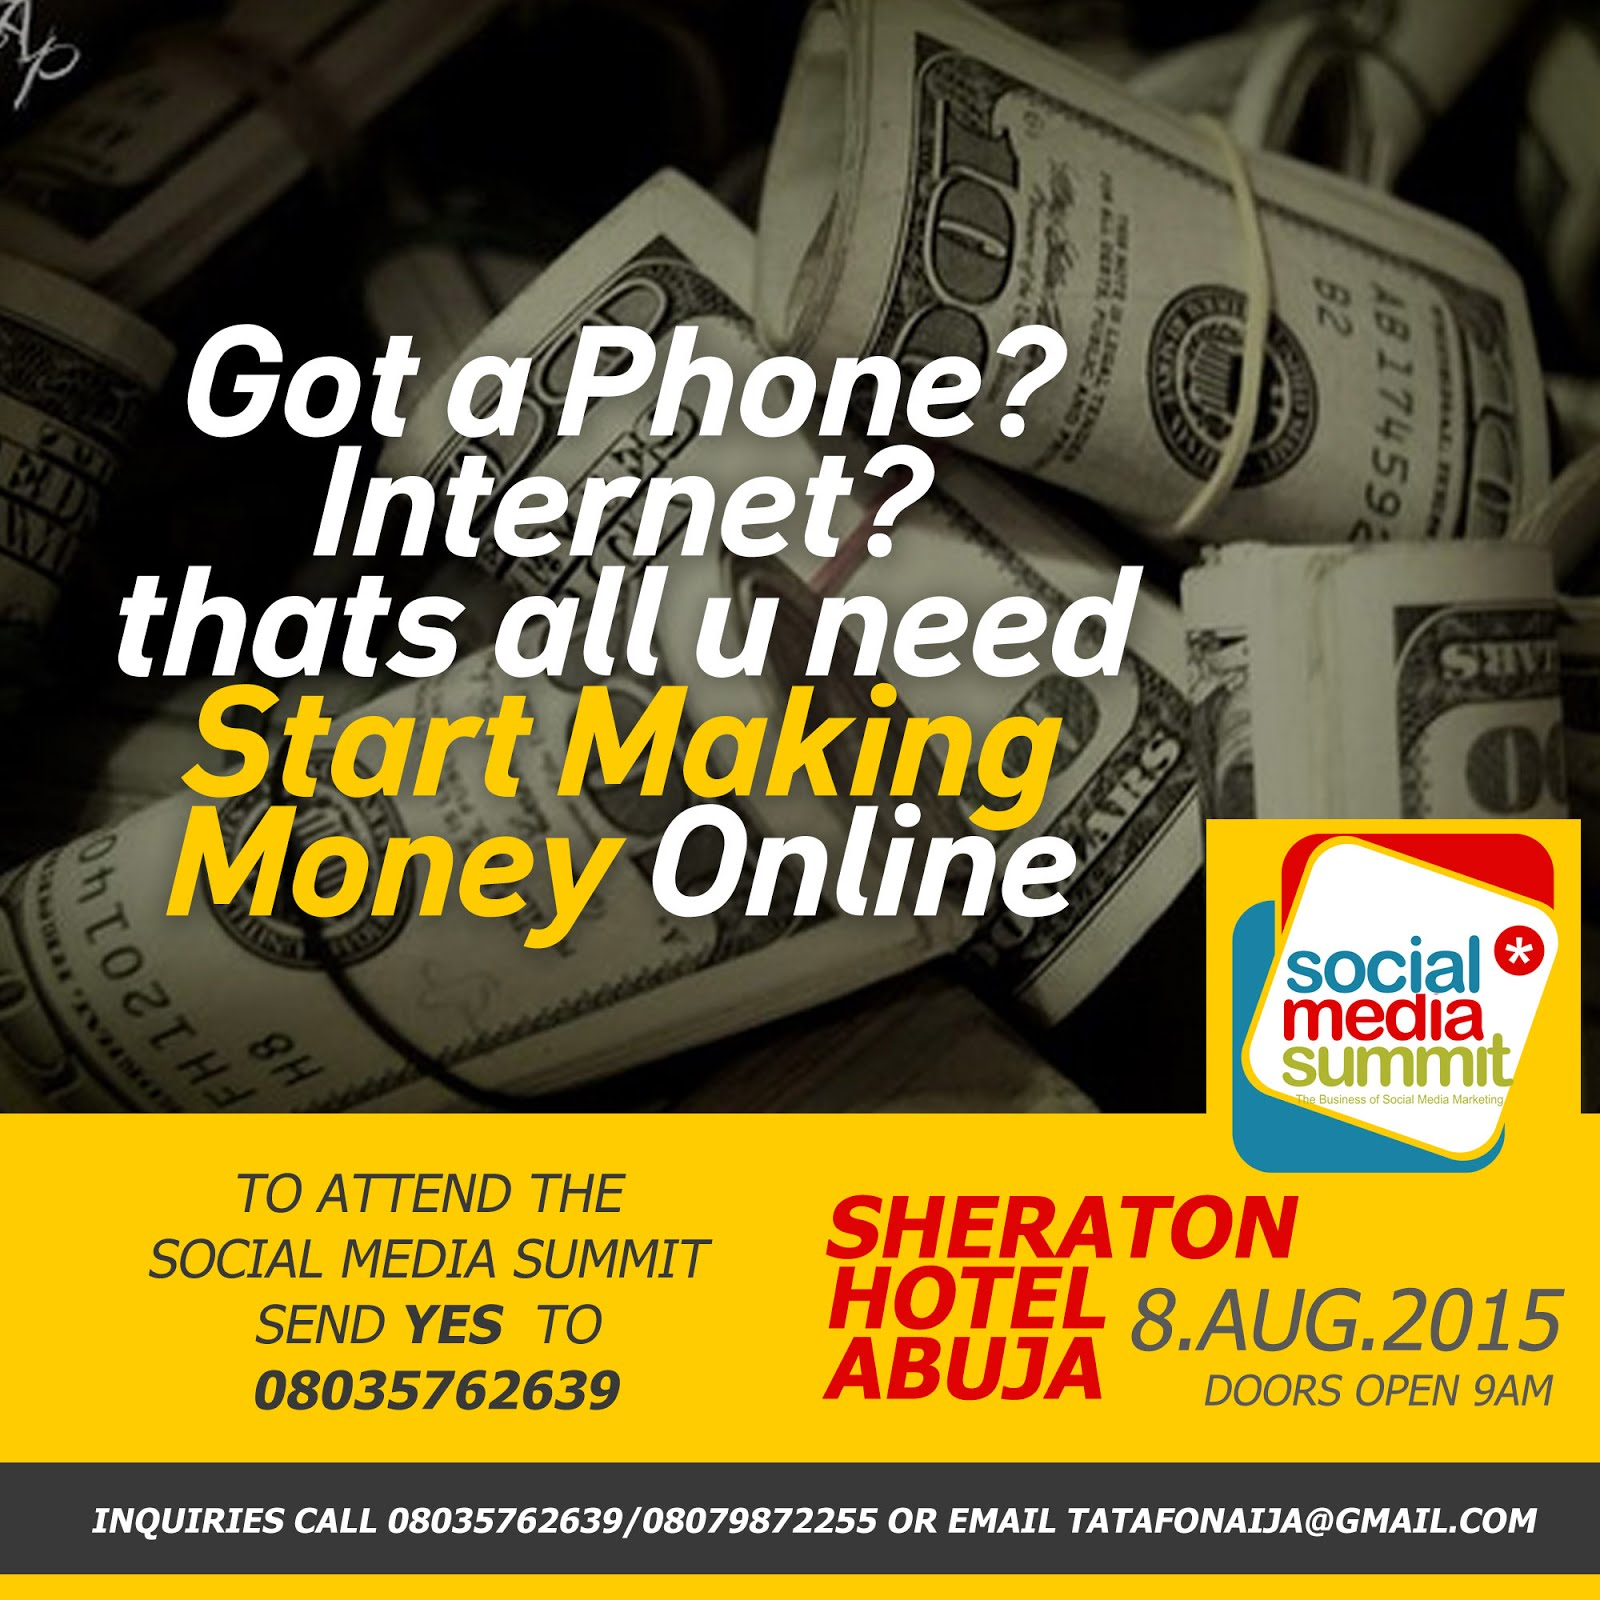 Abuja Social Media Summit